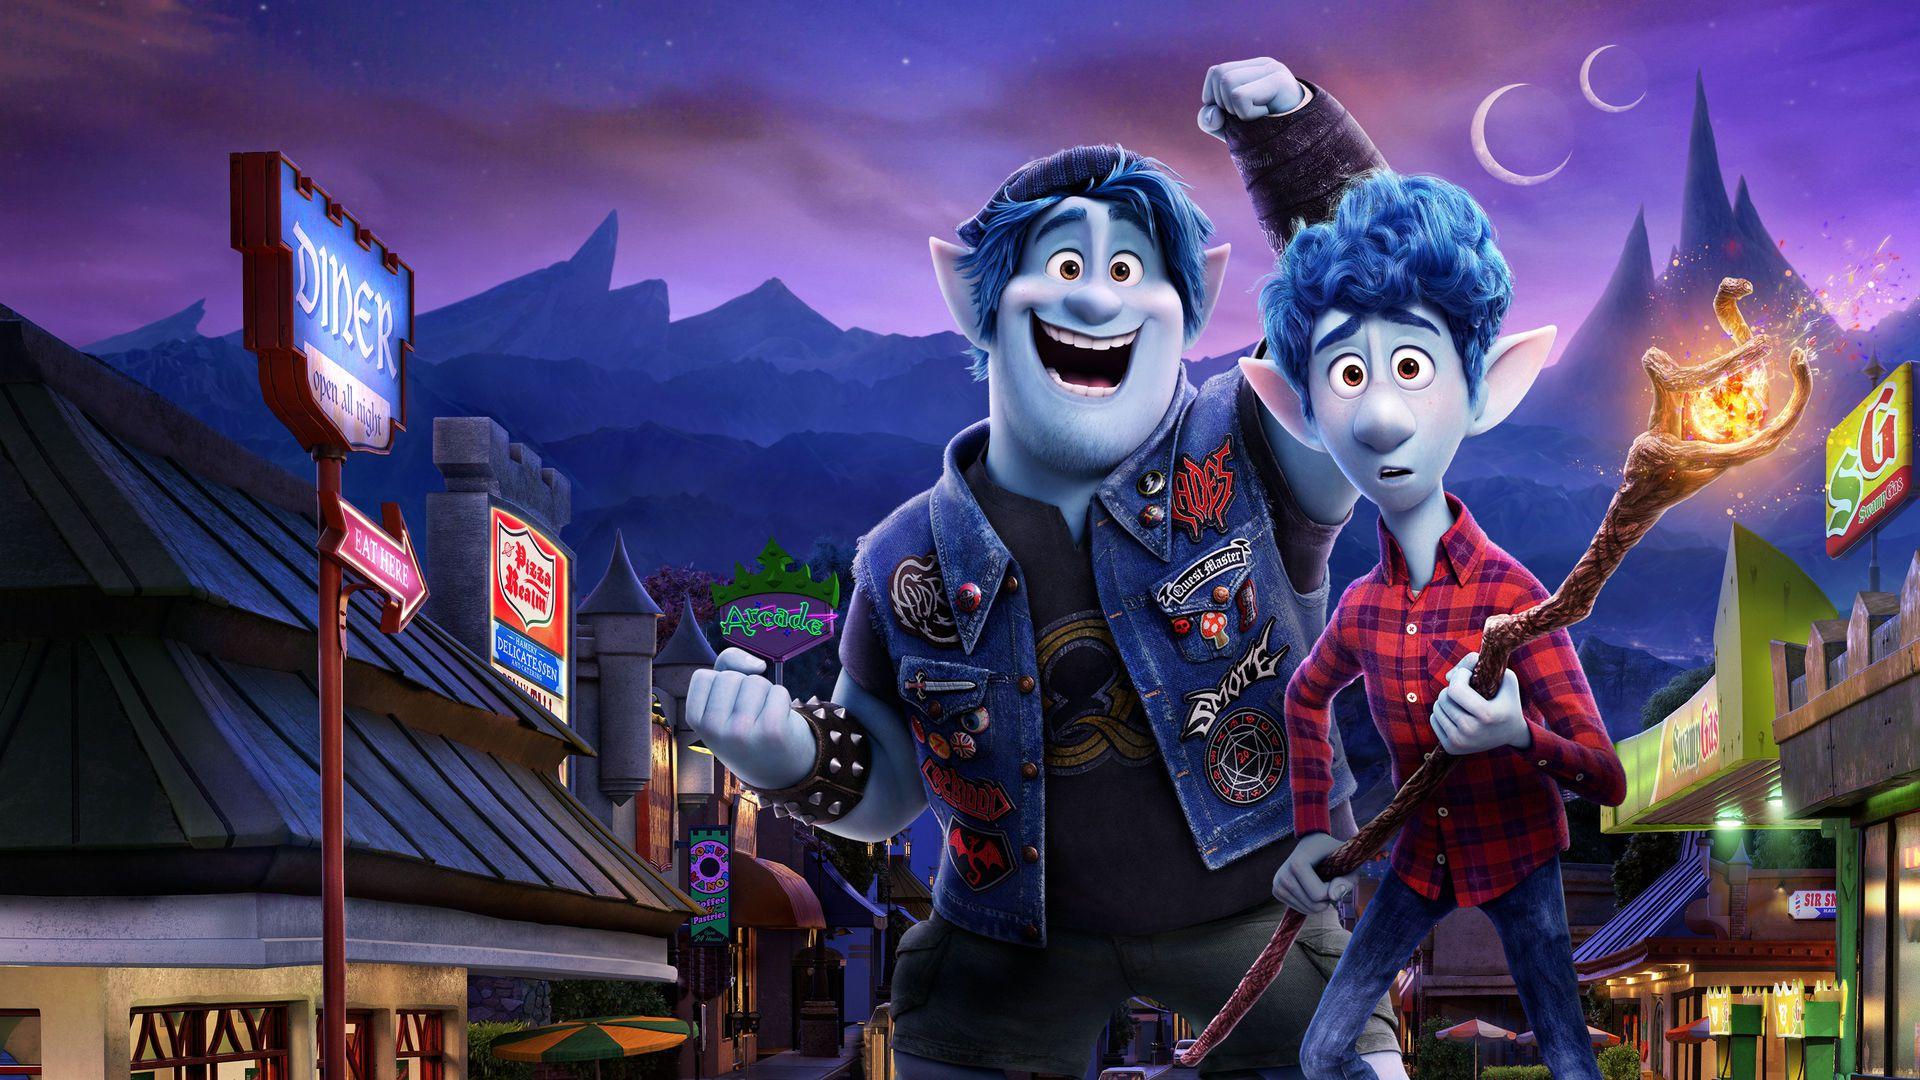 Onward movie on Disney Plus